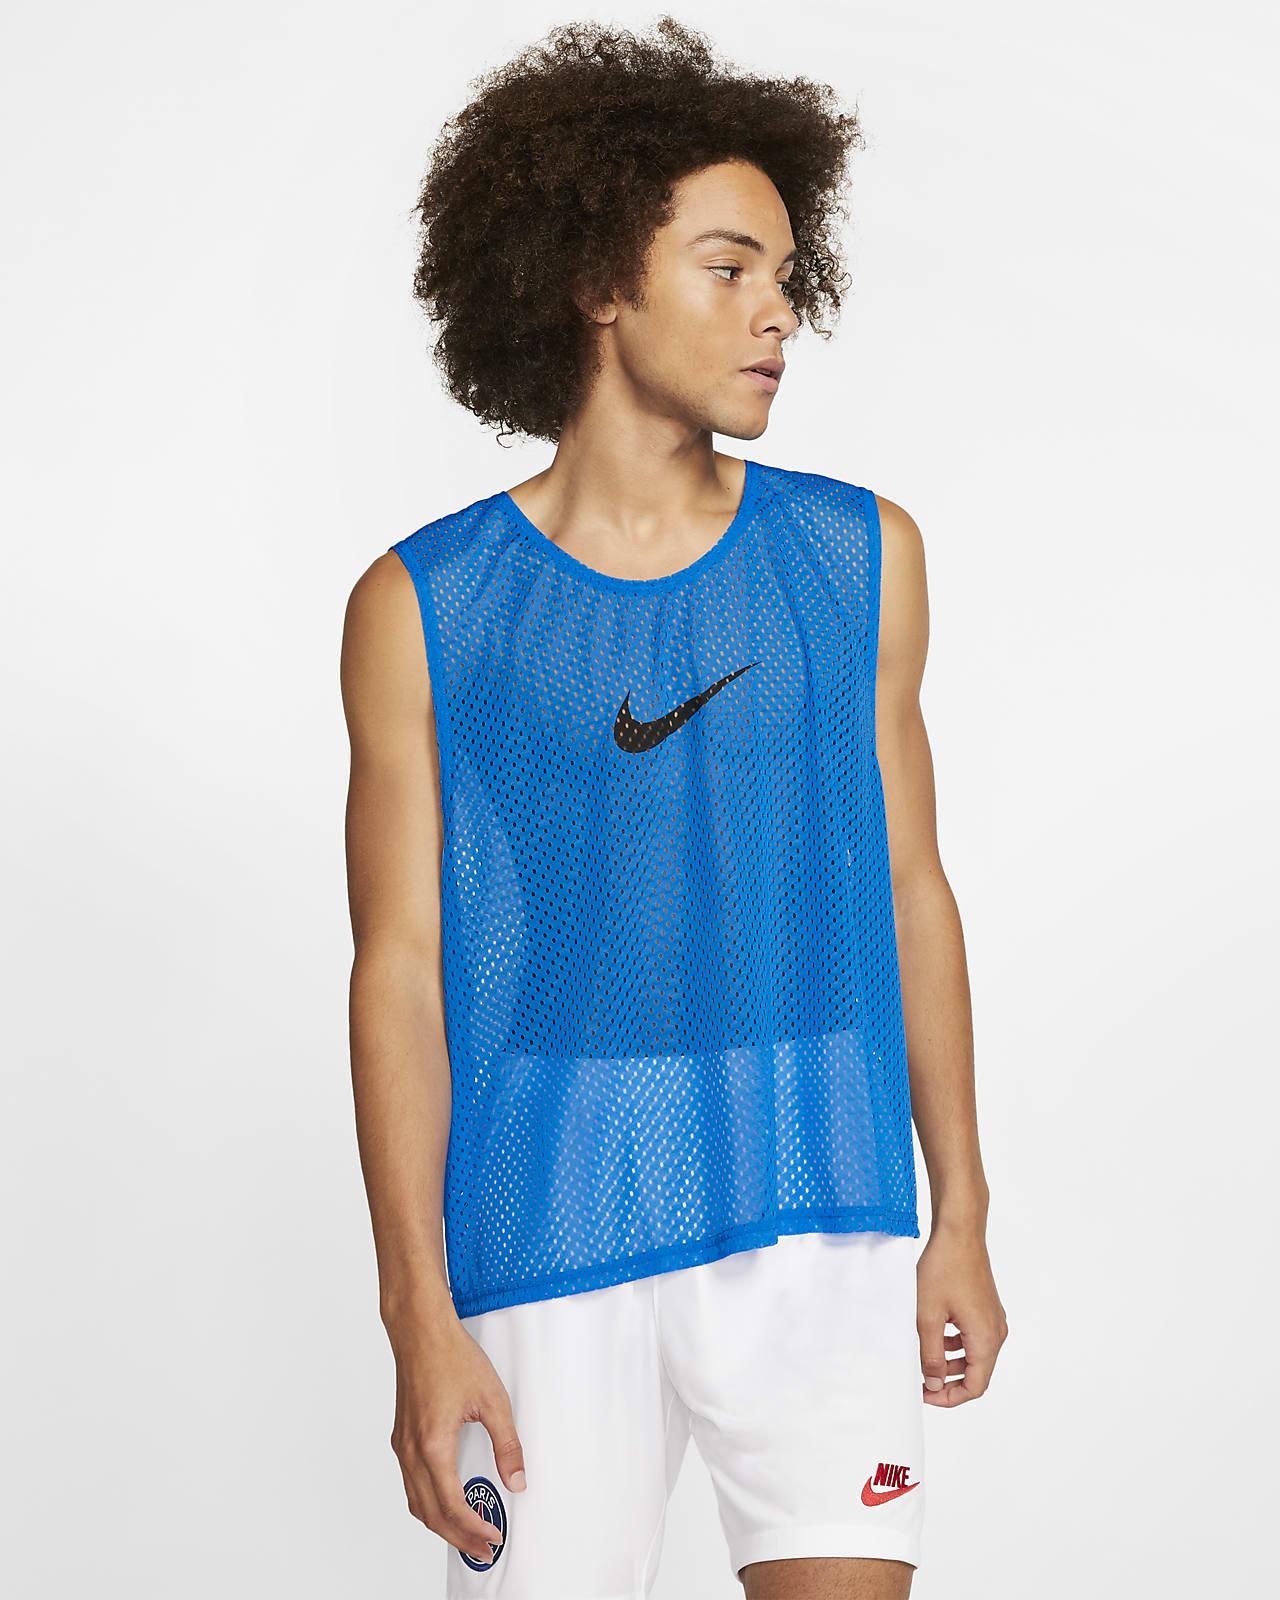 Nike Men's Soccer Training Bib